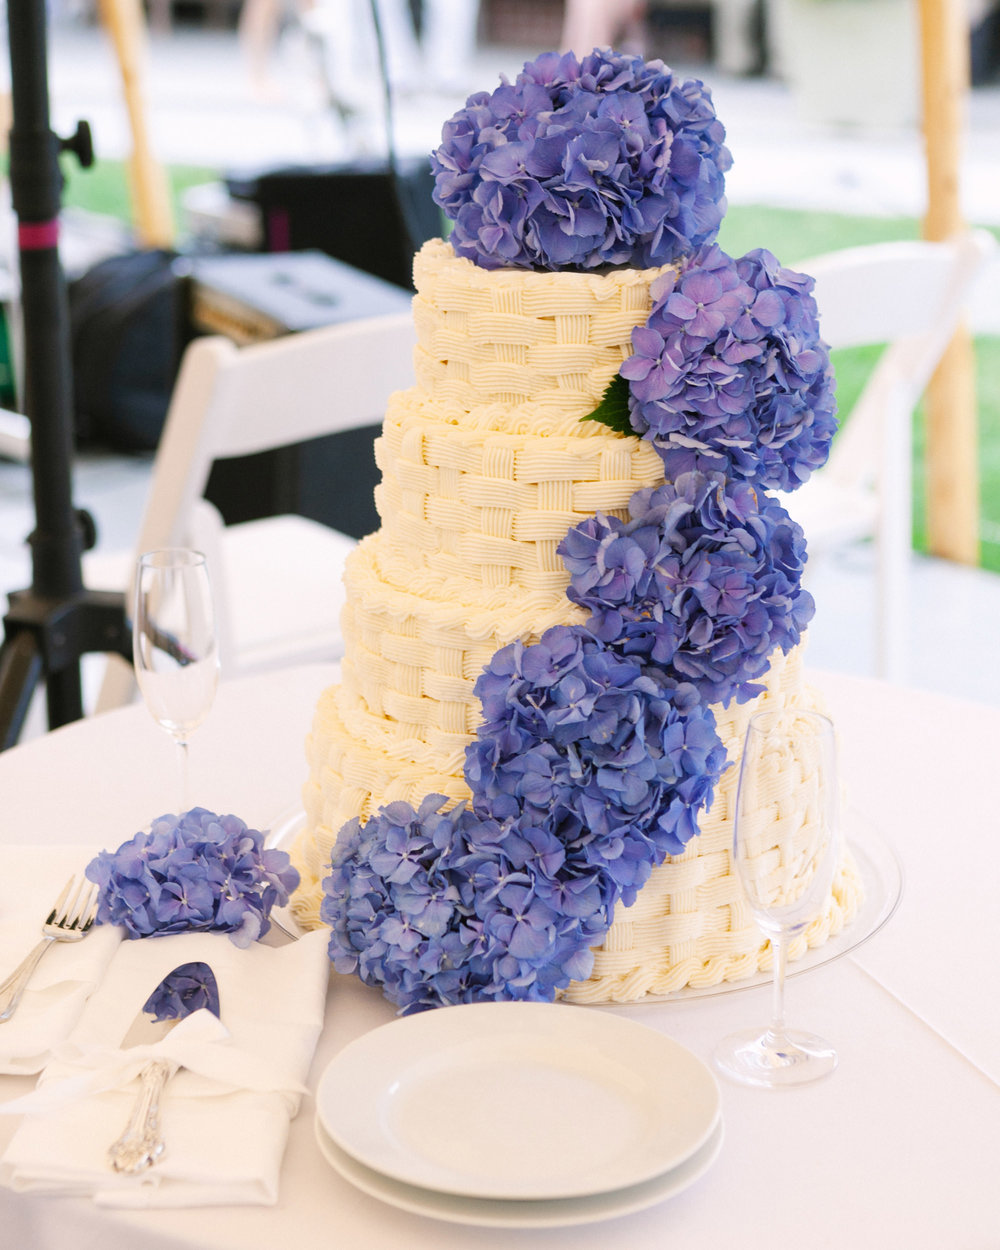 nantucket_siasconset_union_chapel_wedding_photos_39.jpg